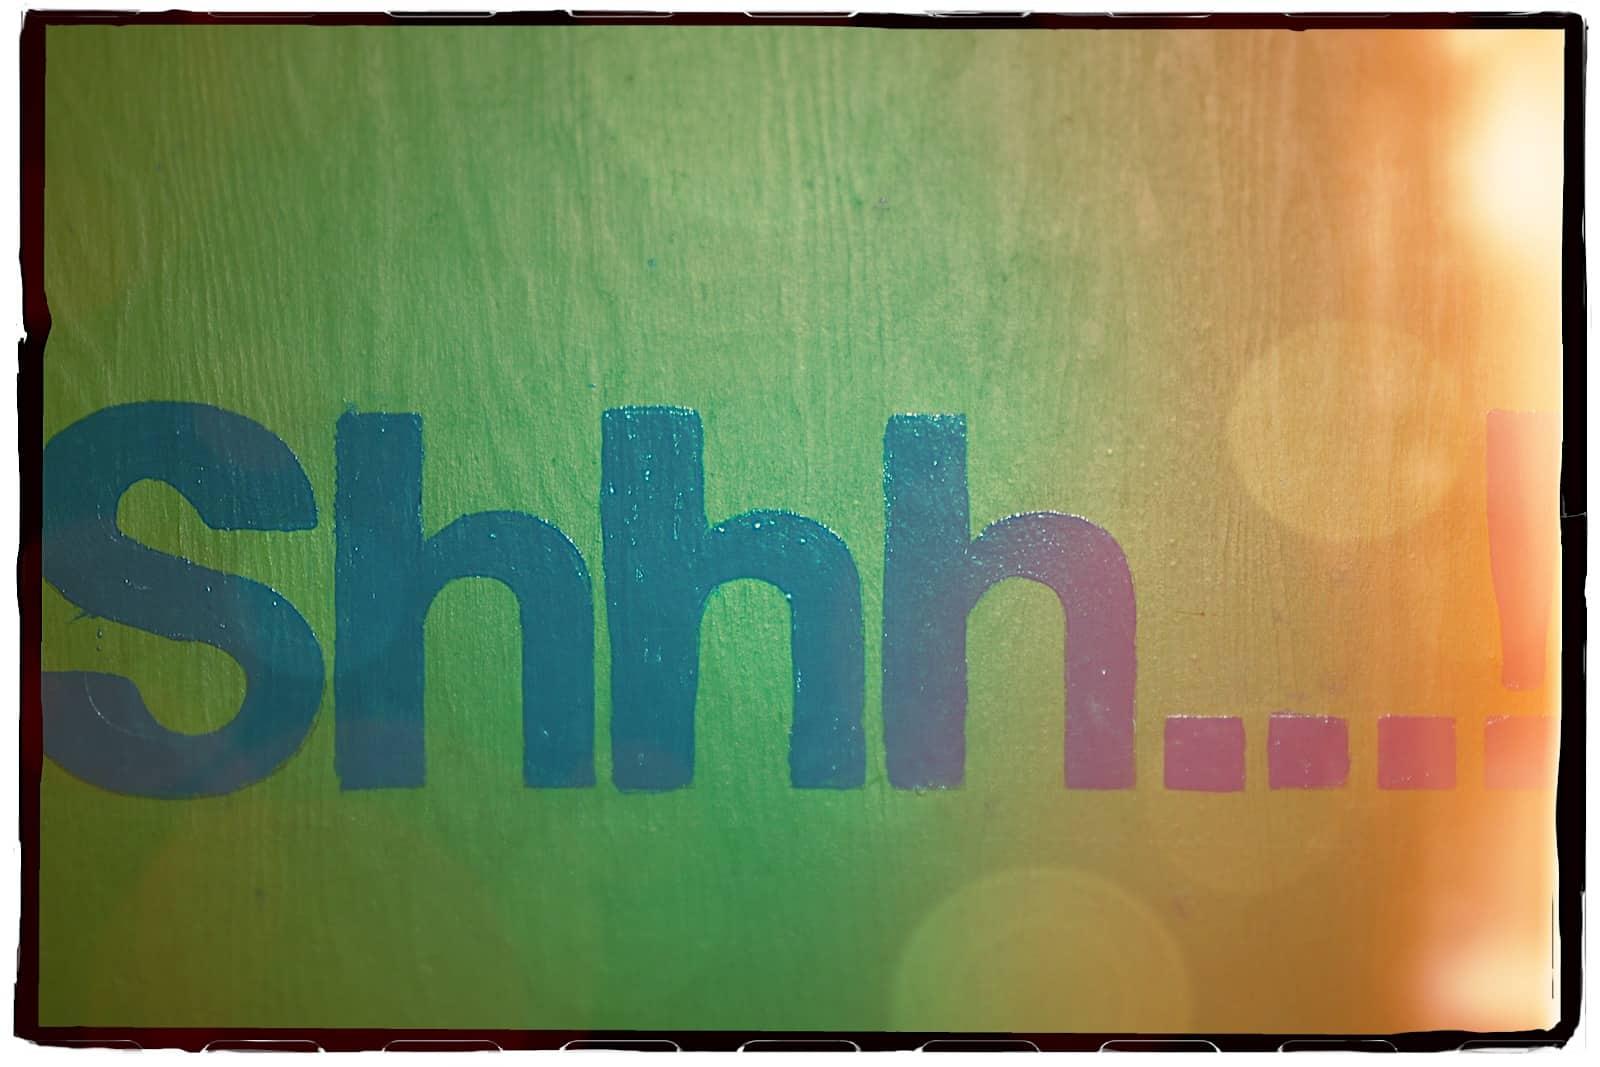 shhh mute iMessage